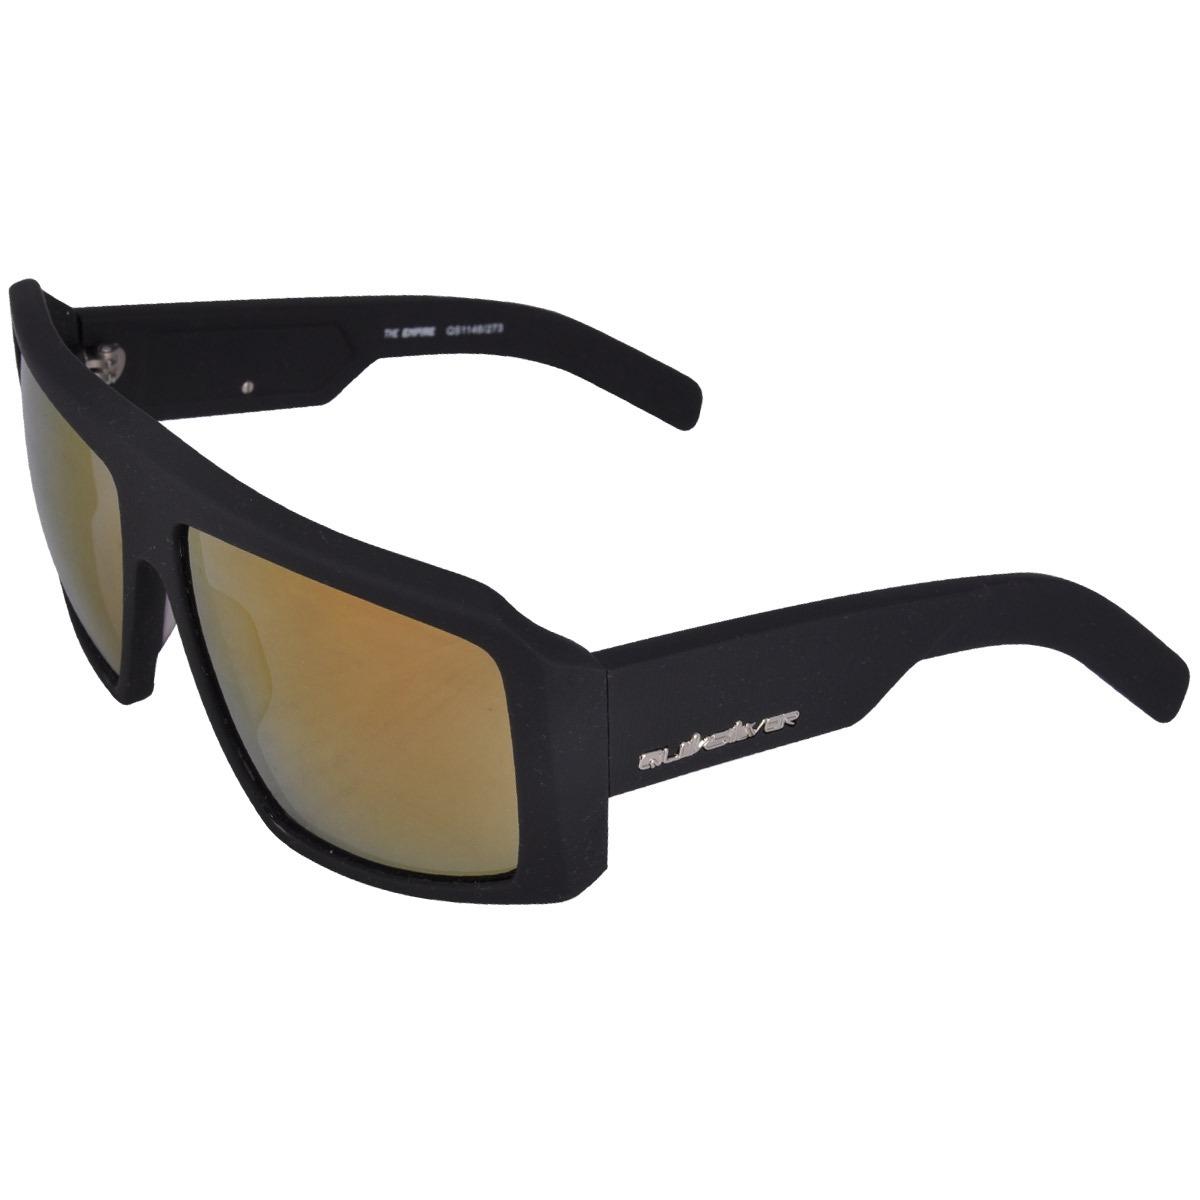 Óculos Quiksilver The Empire Ii Preto - Cut Wave - R  119,90 em ... 2c6f75c496